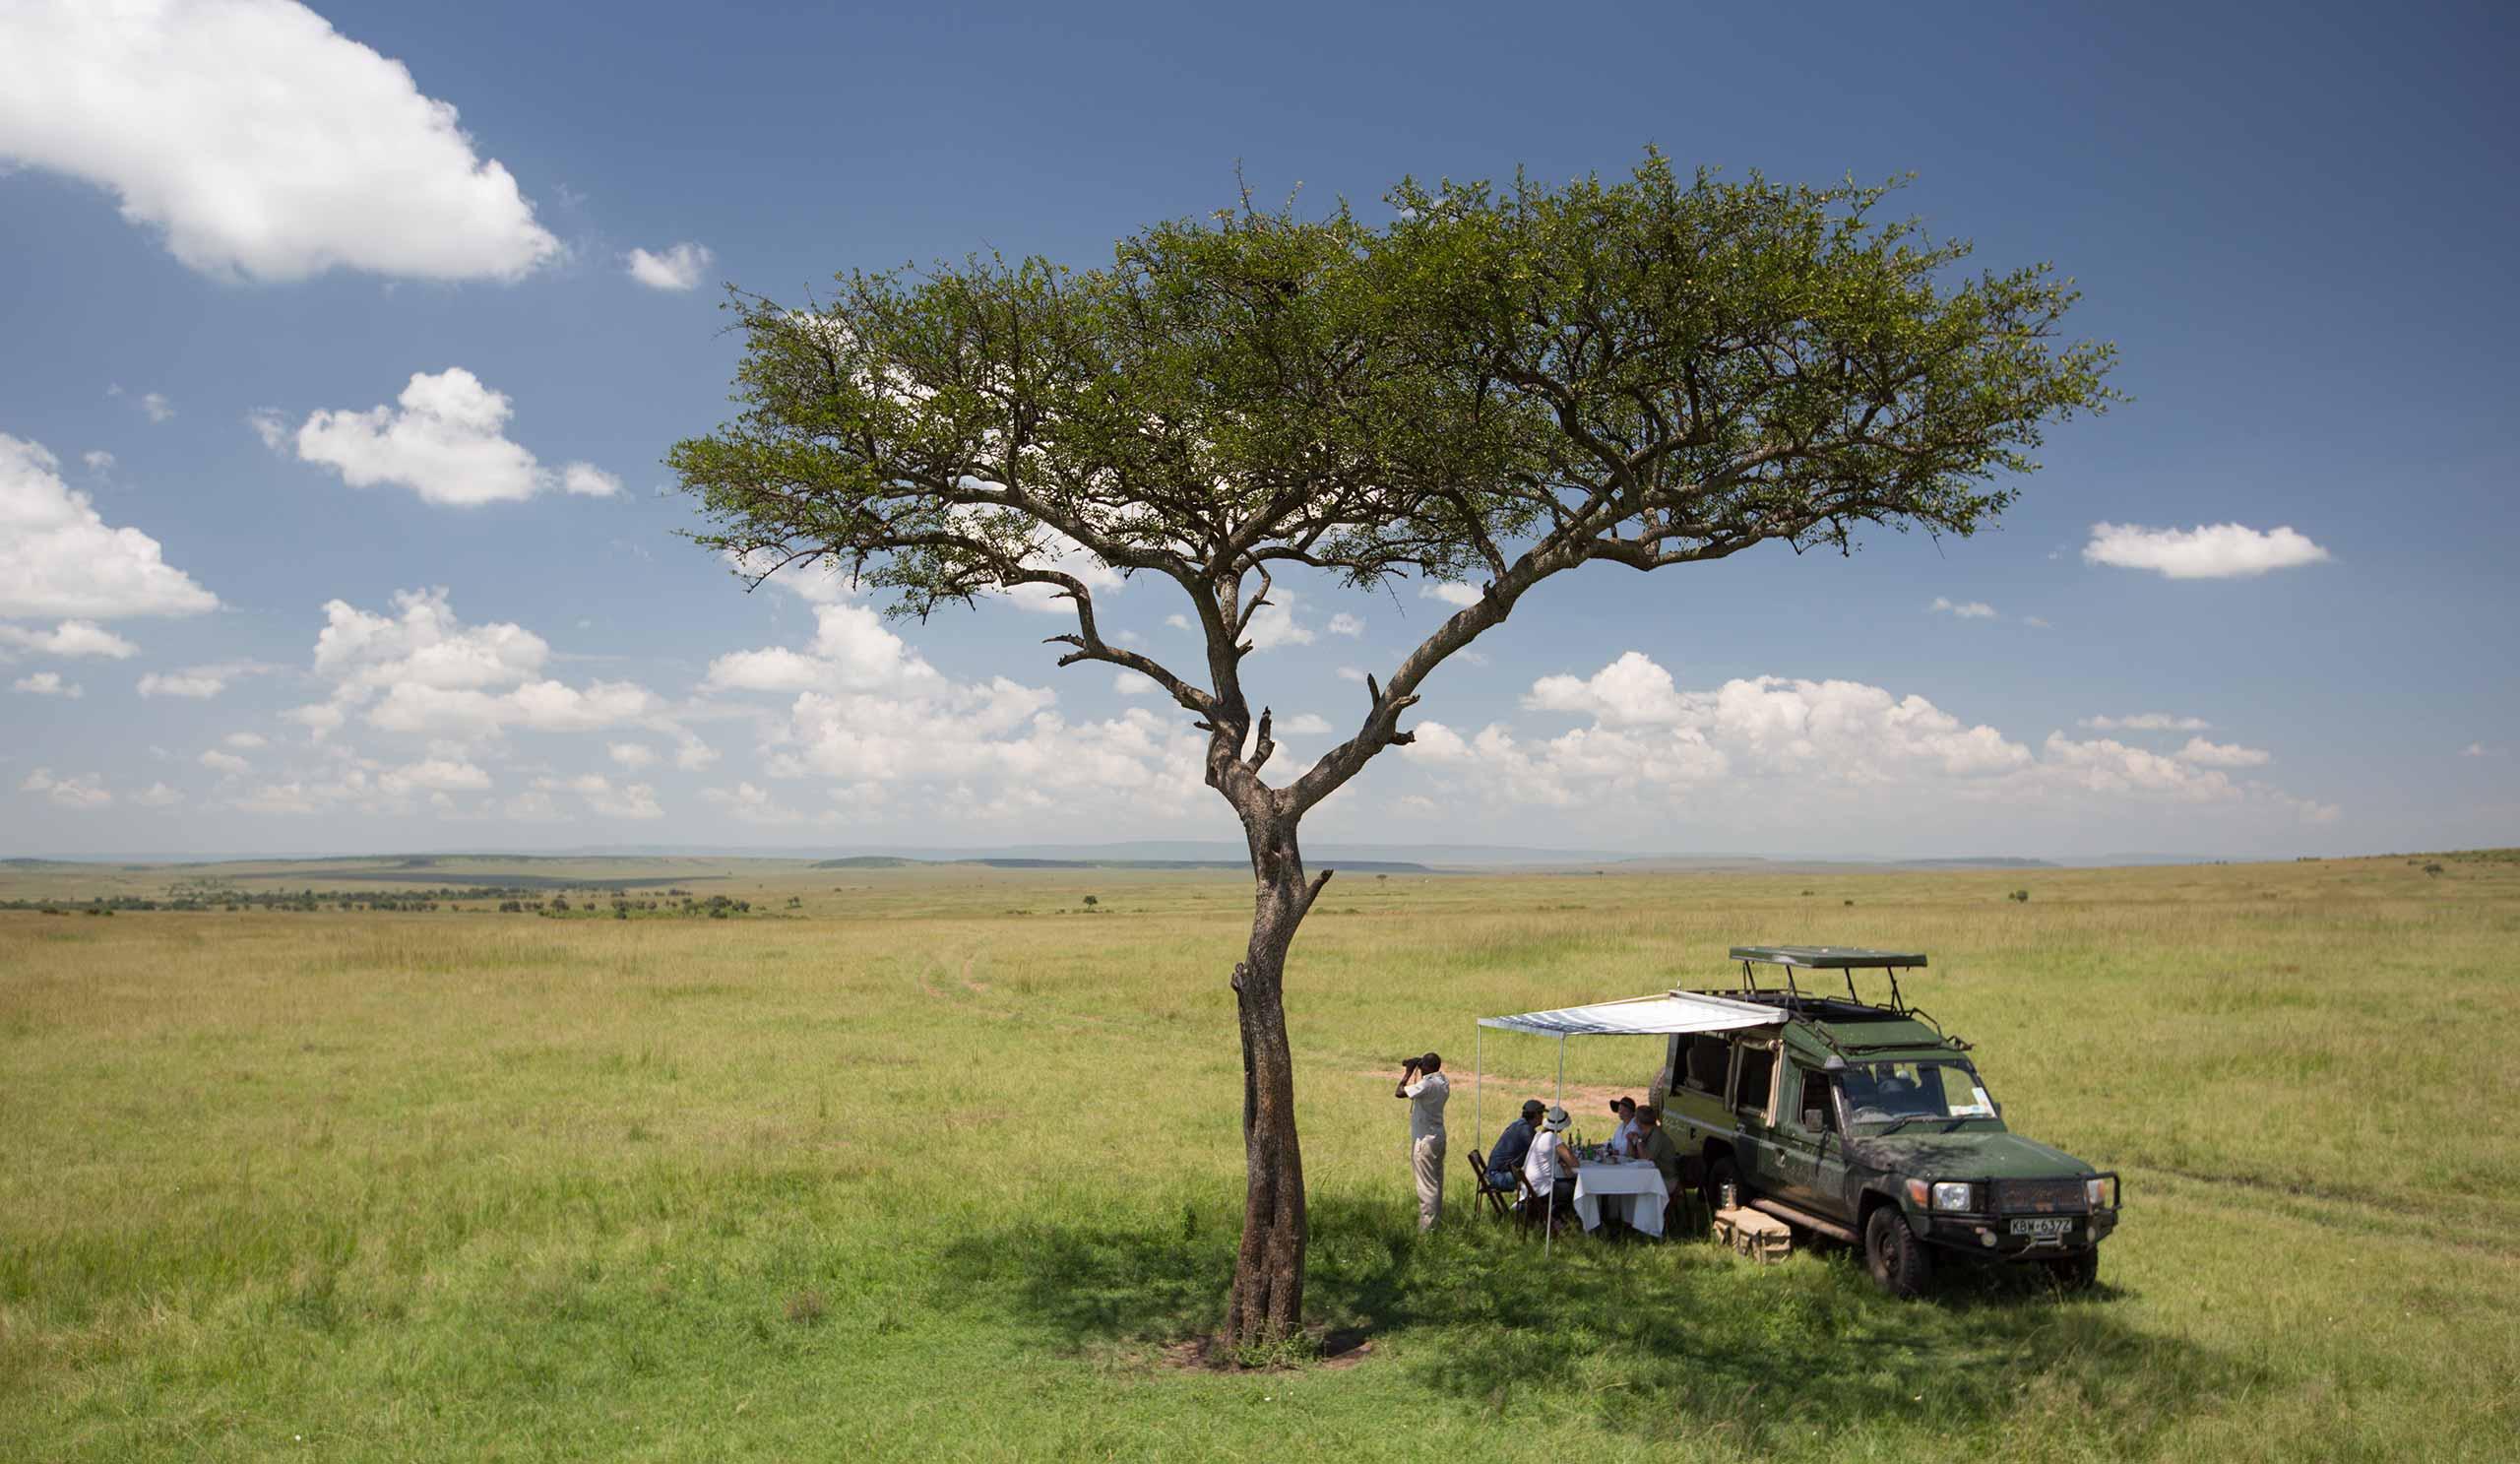 enkosi-africa-safari-kenia-masai-mara-sand-river-camp-elewana-Picnic-Luncheon-(c)-Silverless